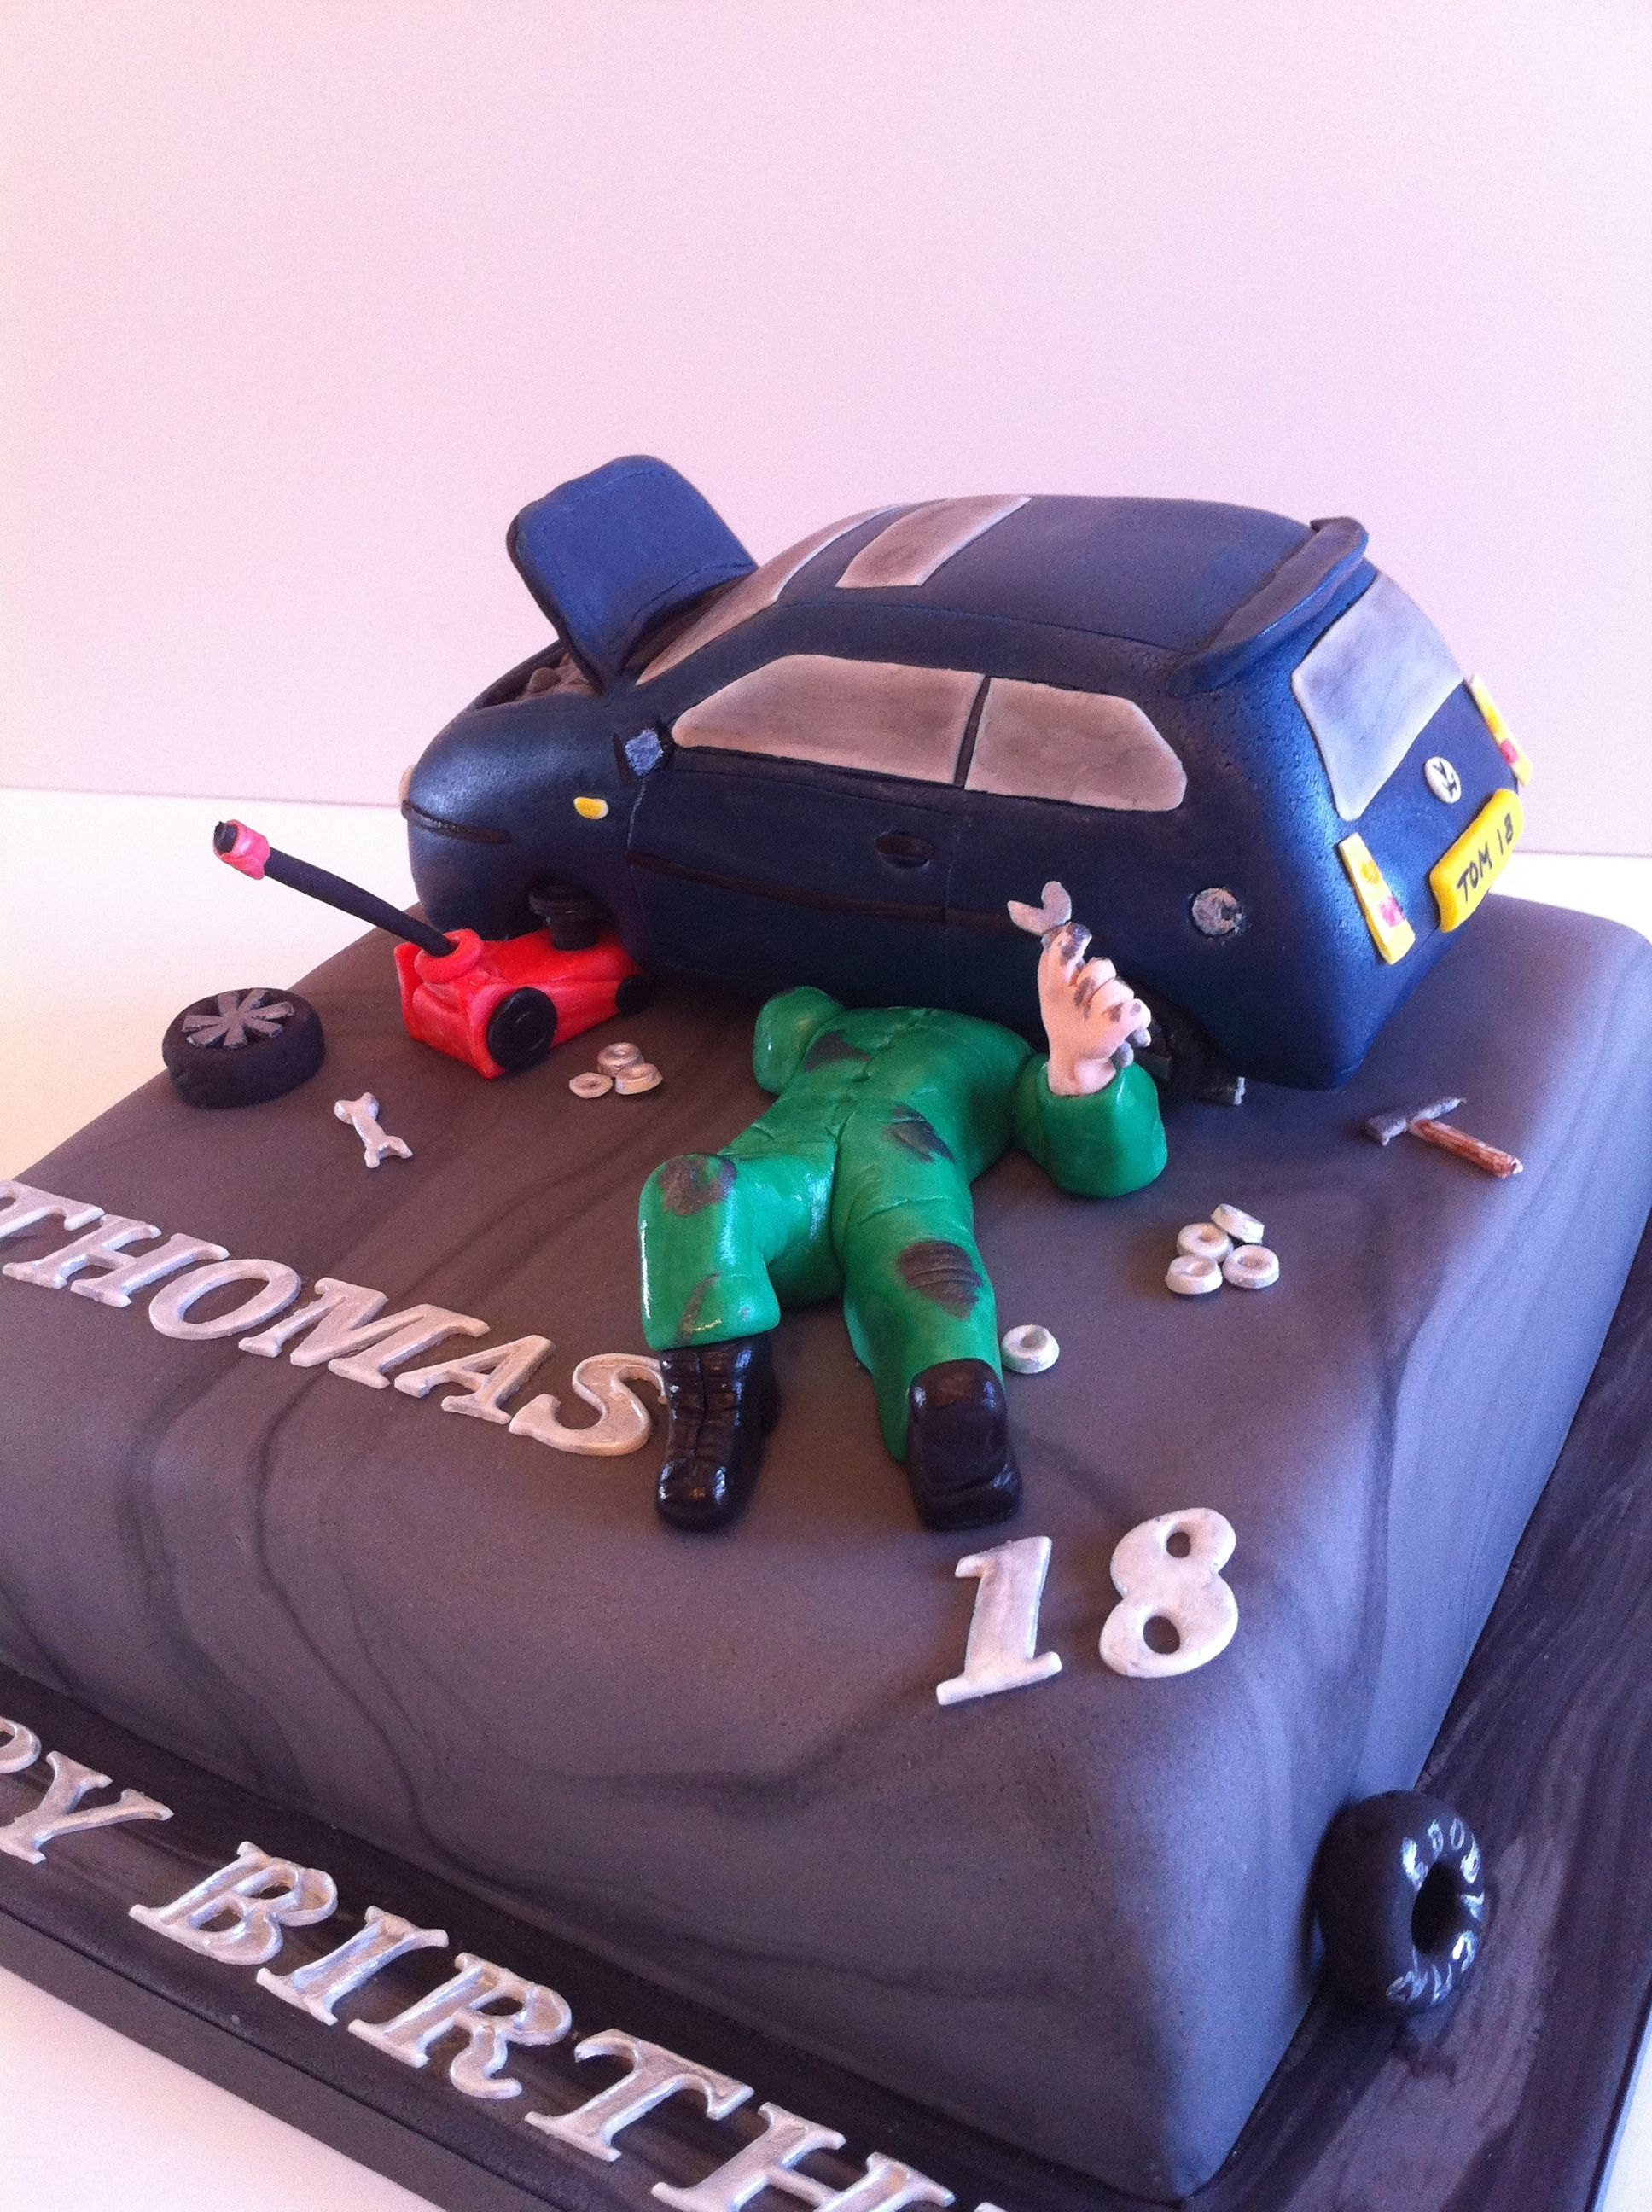 Auto mechanic graduation cake utigraduationcake automechaniccake